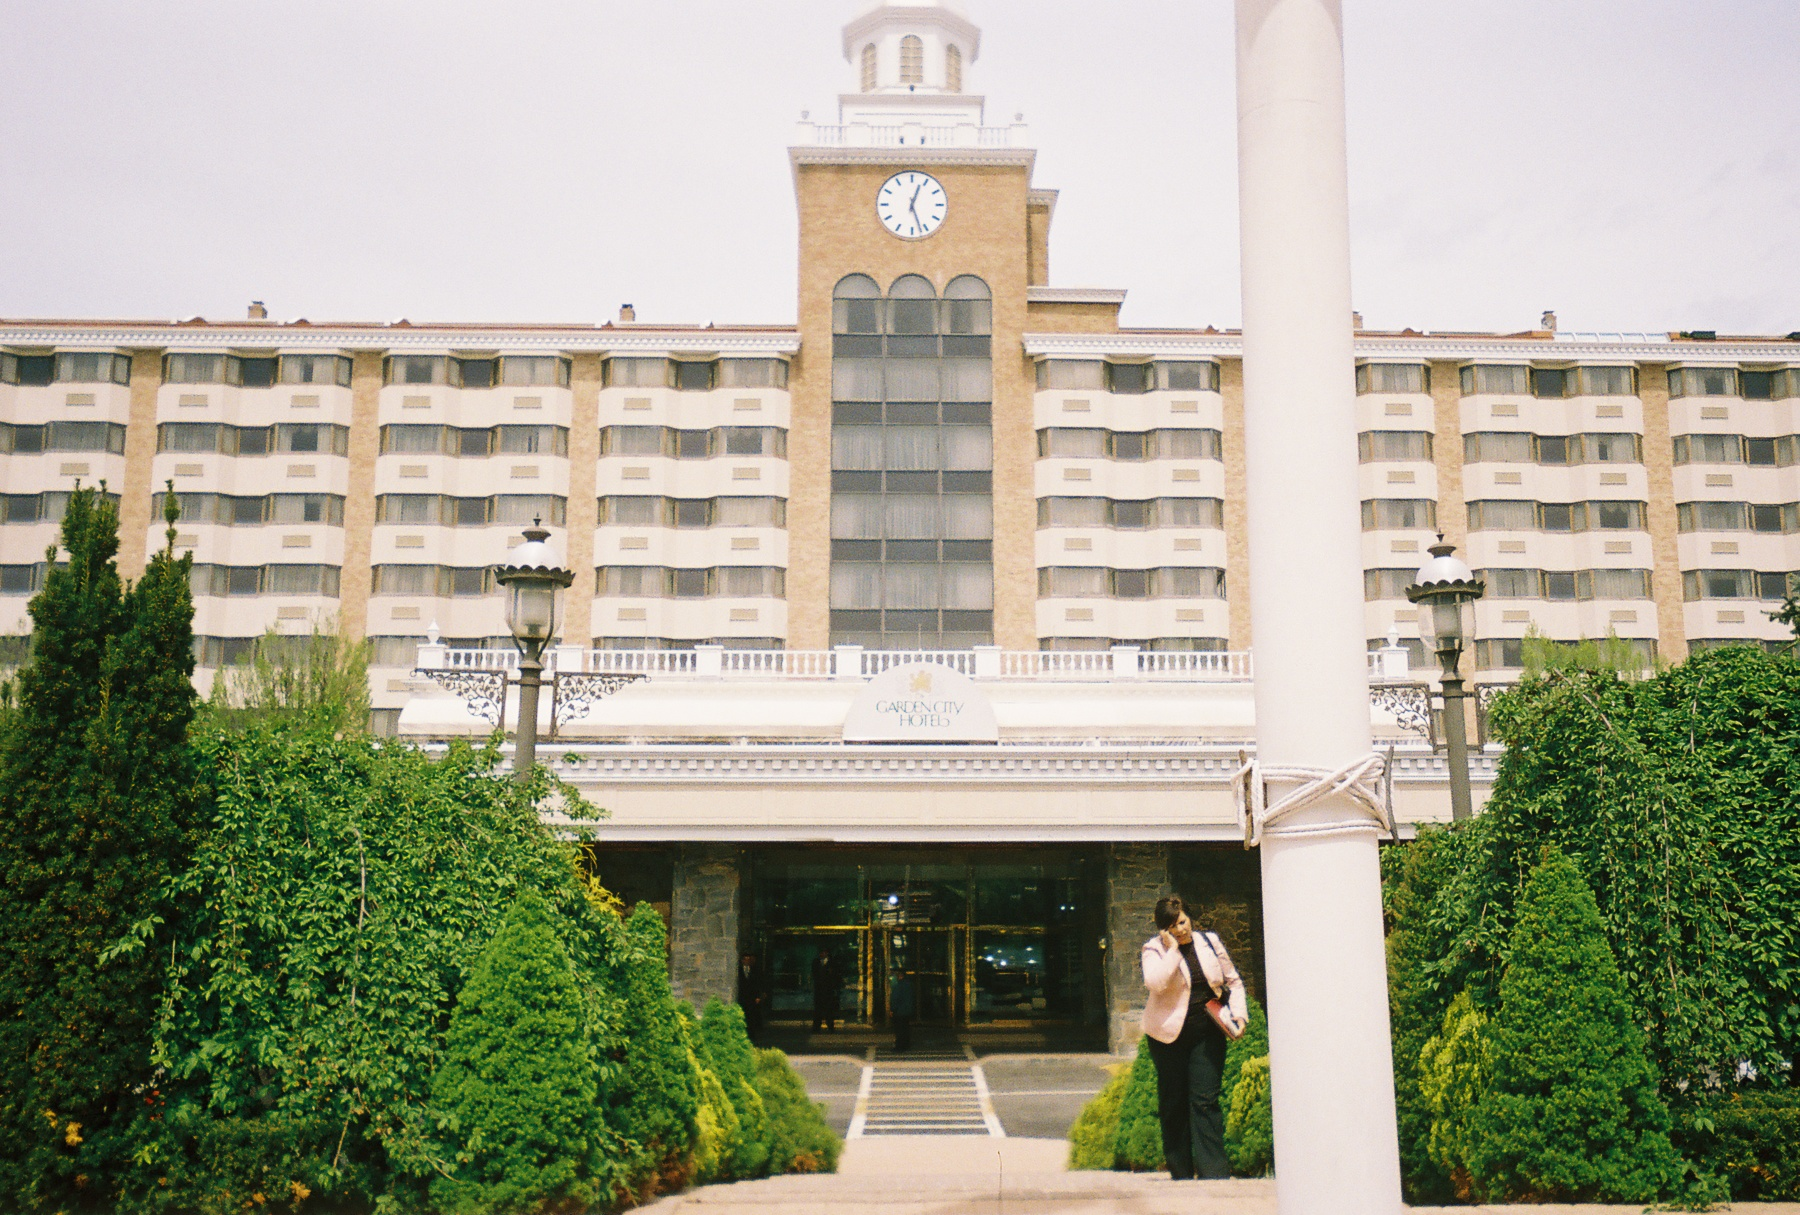 Garden city hotel brunch cost